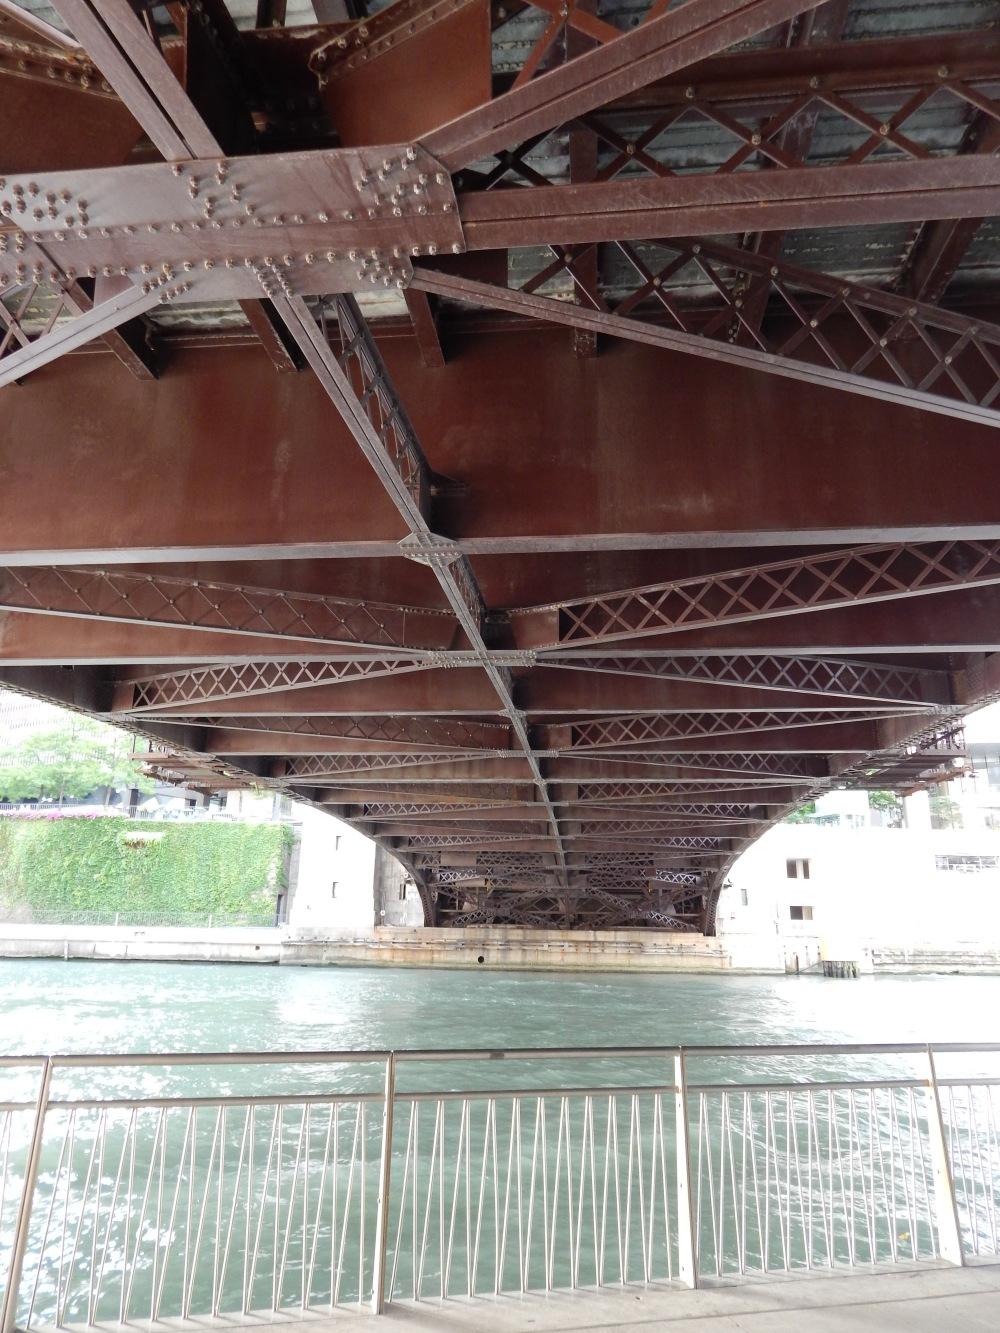 Under the bridge on River Walk